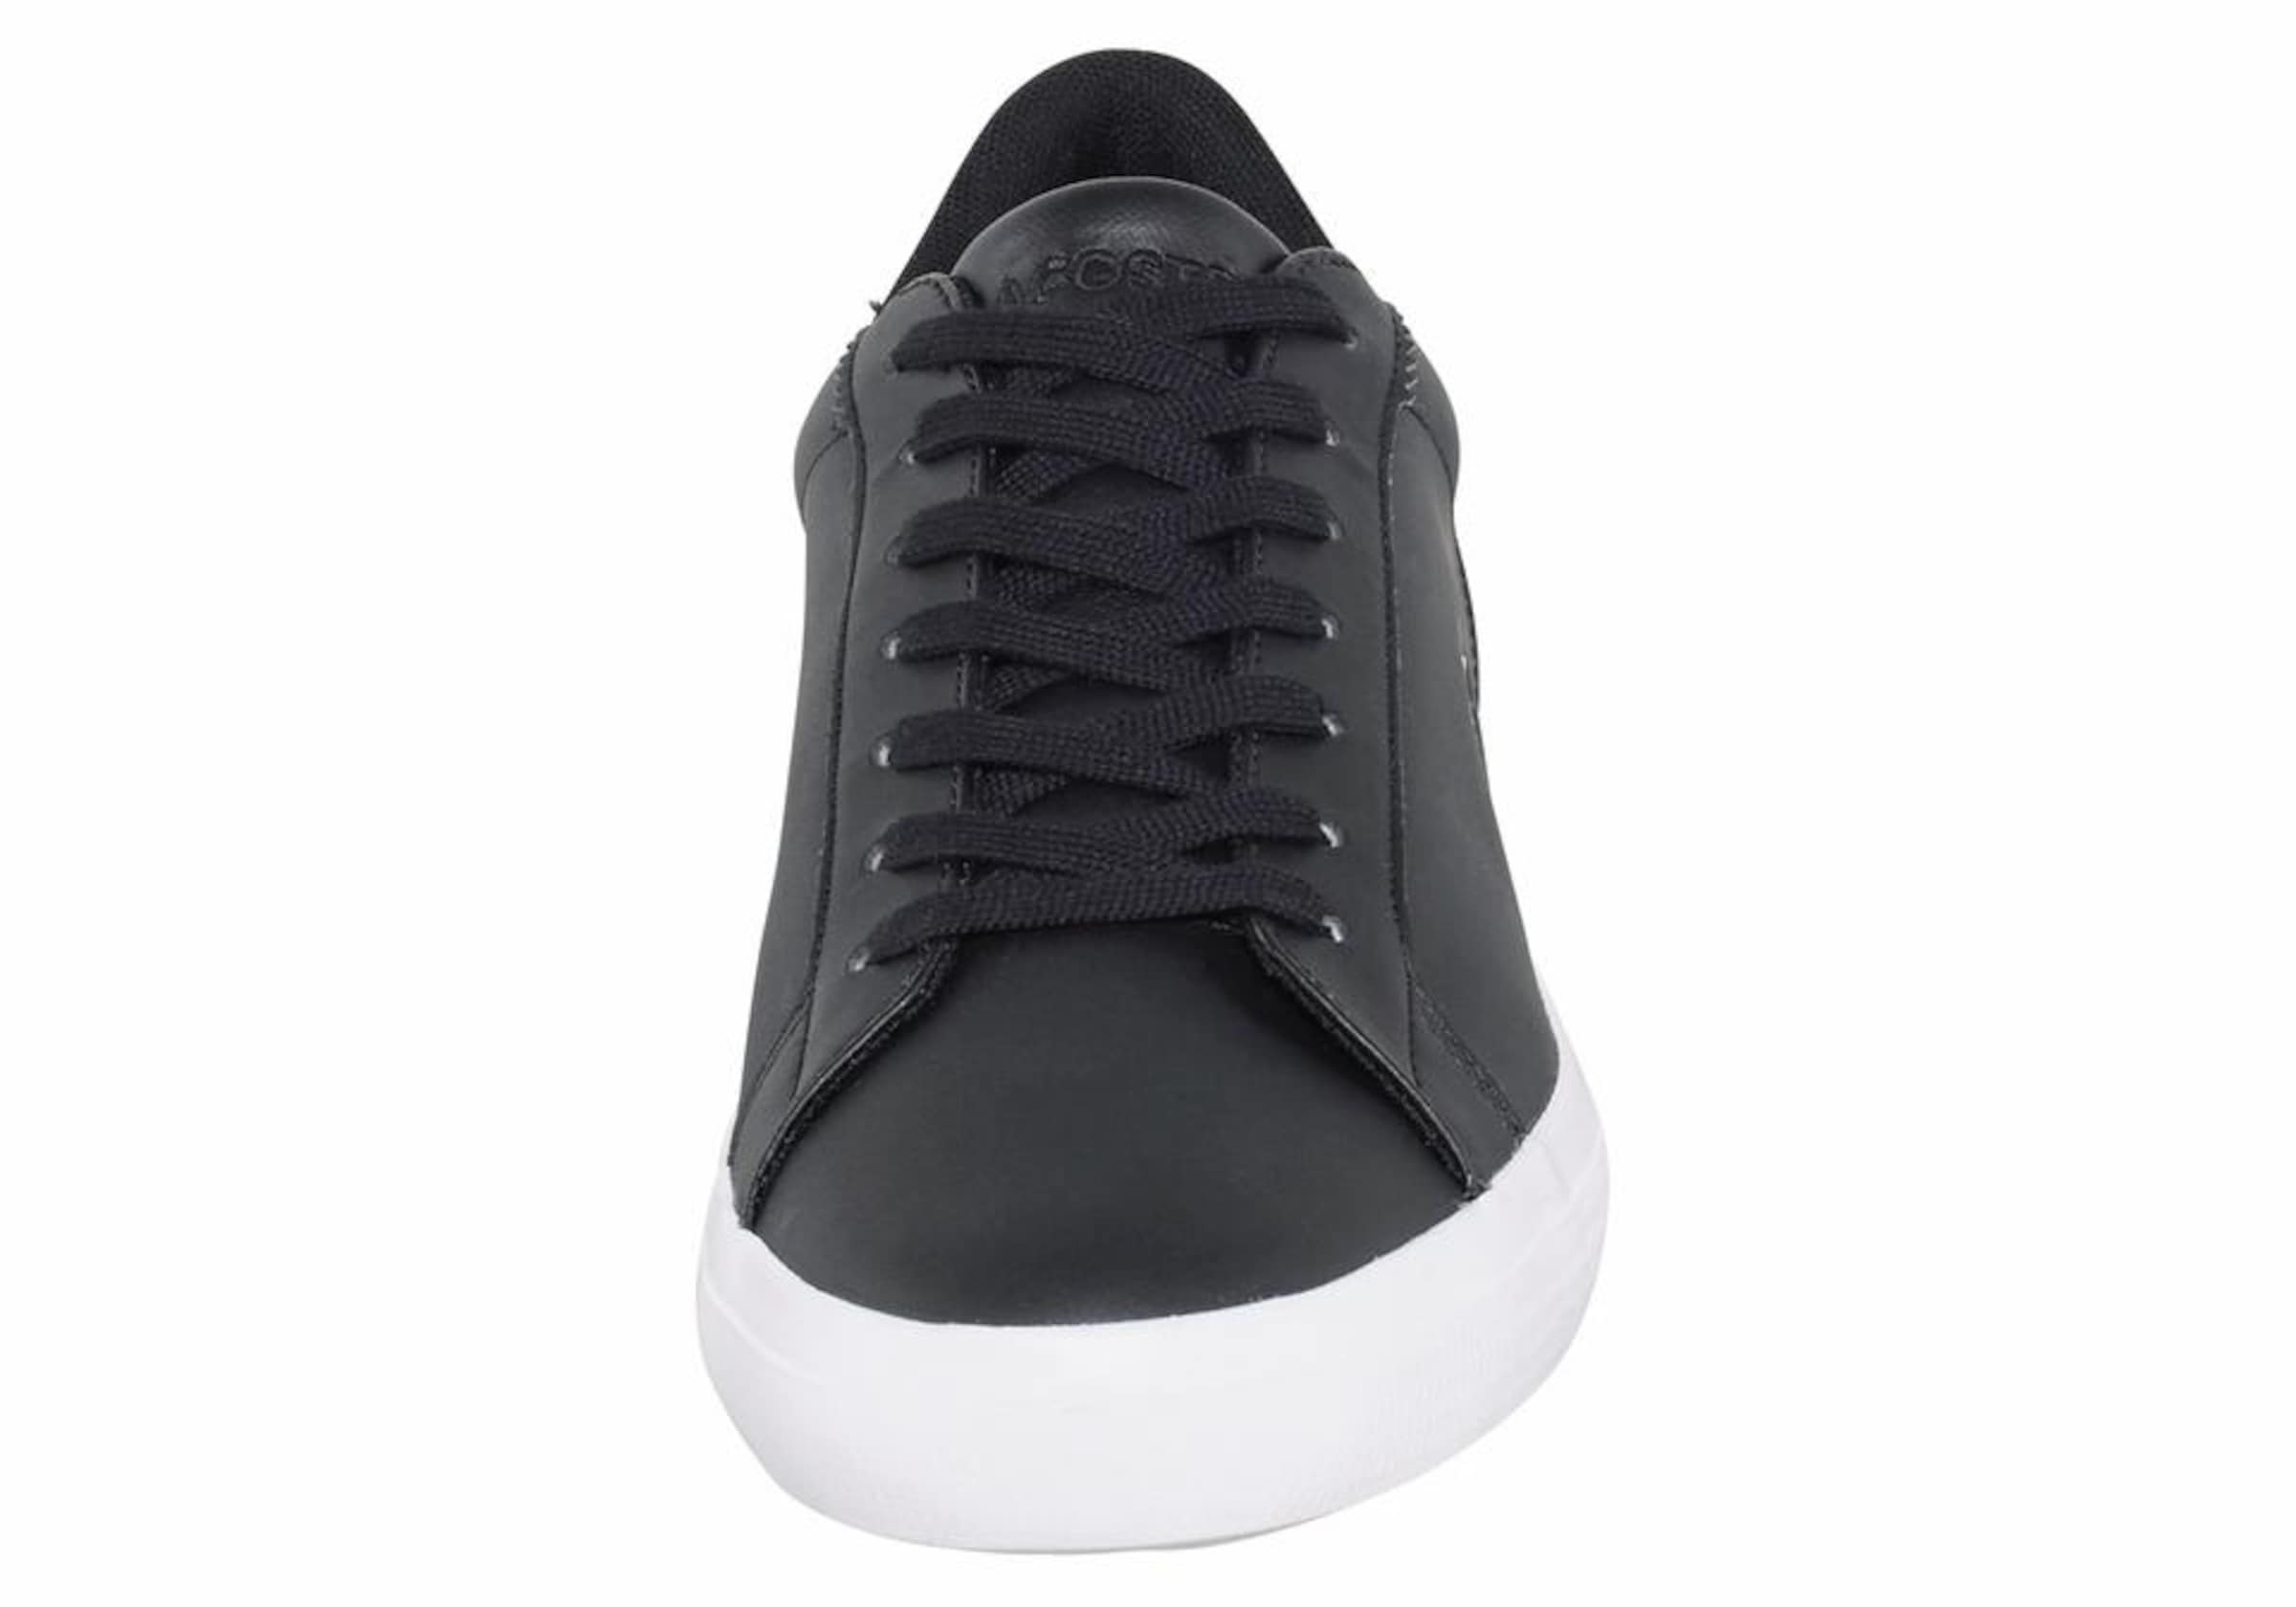 Sneaker Bl 1 Cam' Lacoste 'lerond In Schwarz Ygbfy7v6